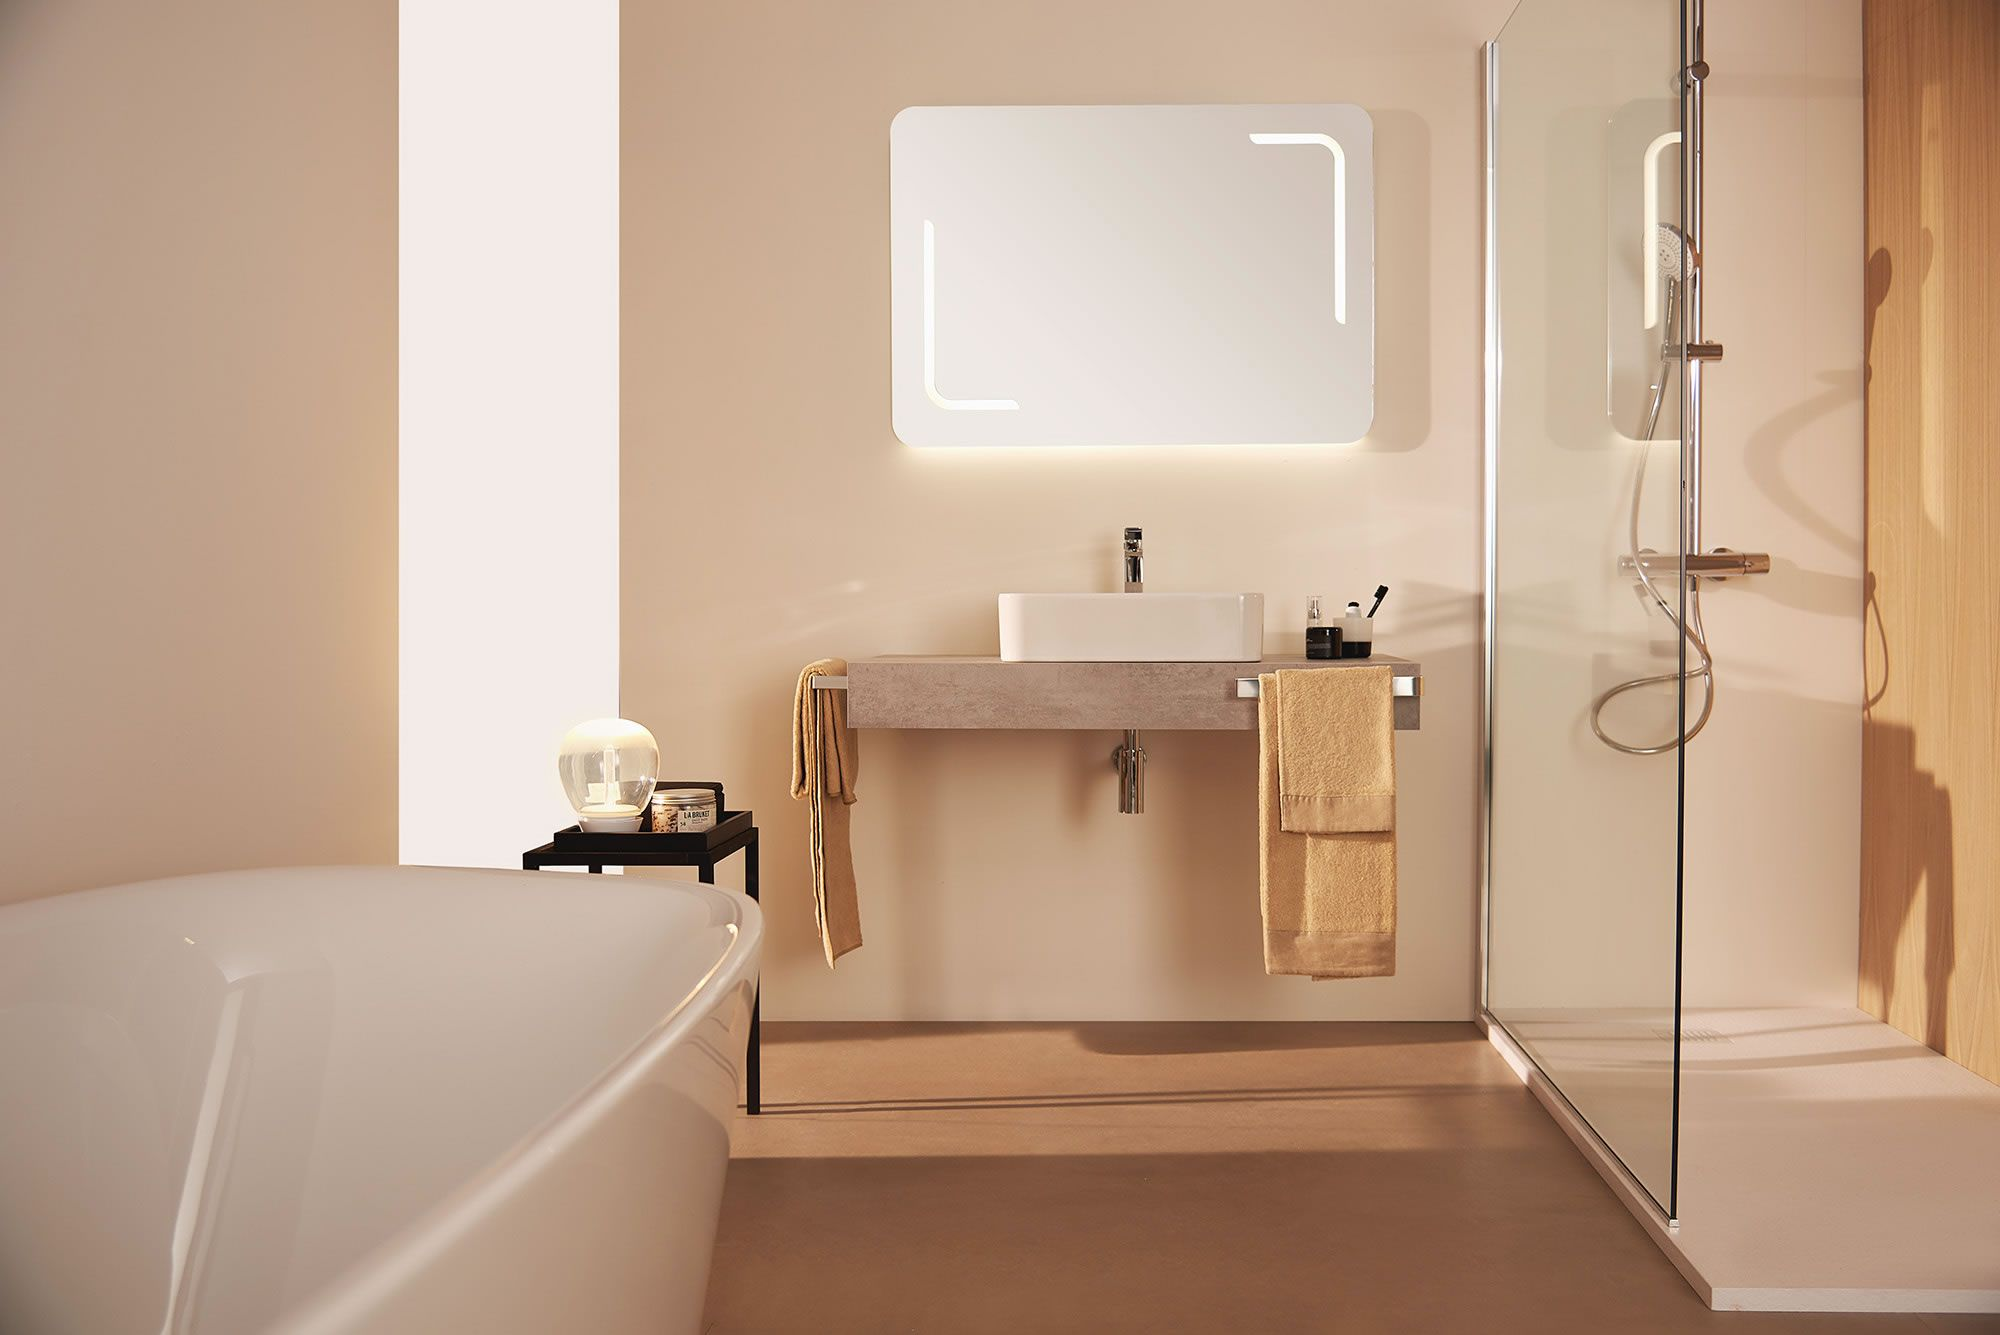 Sanitari Scala Ideal Standard elegance, functionality, customization: the perfect balance